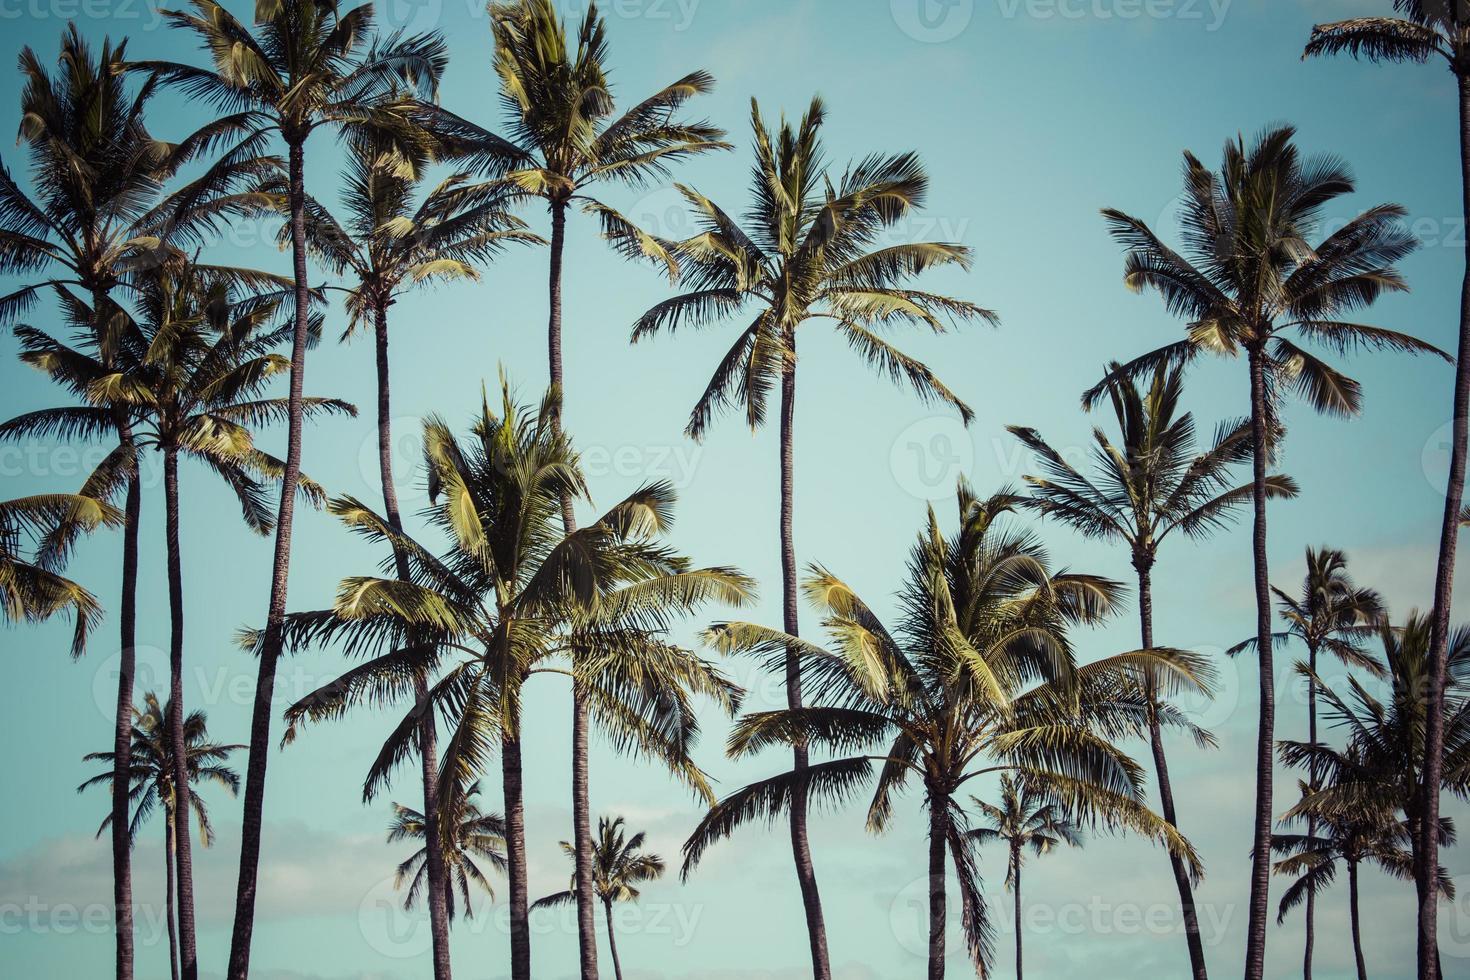 Kokospalme in Hawaii, USA. foto